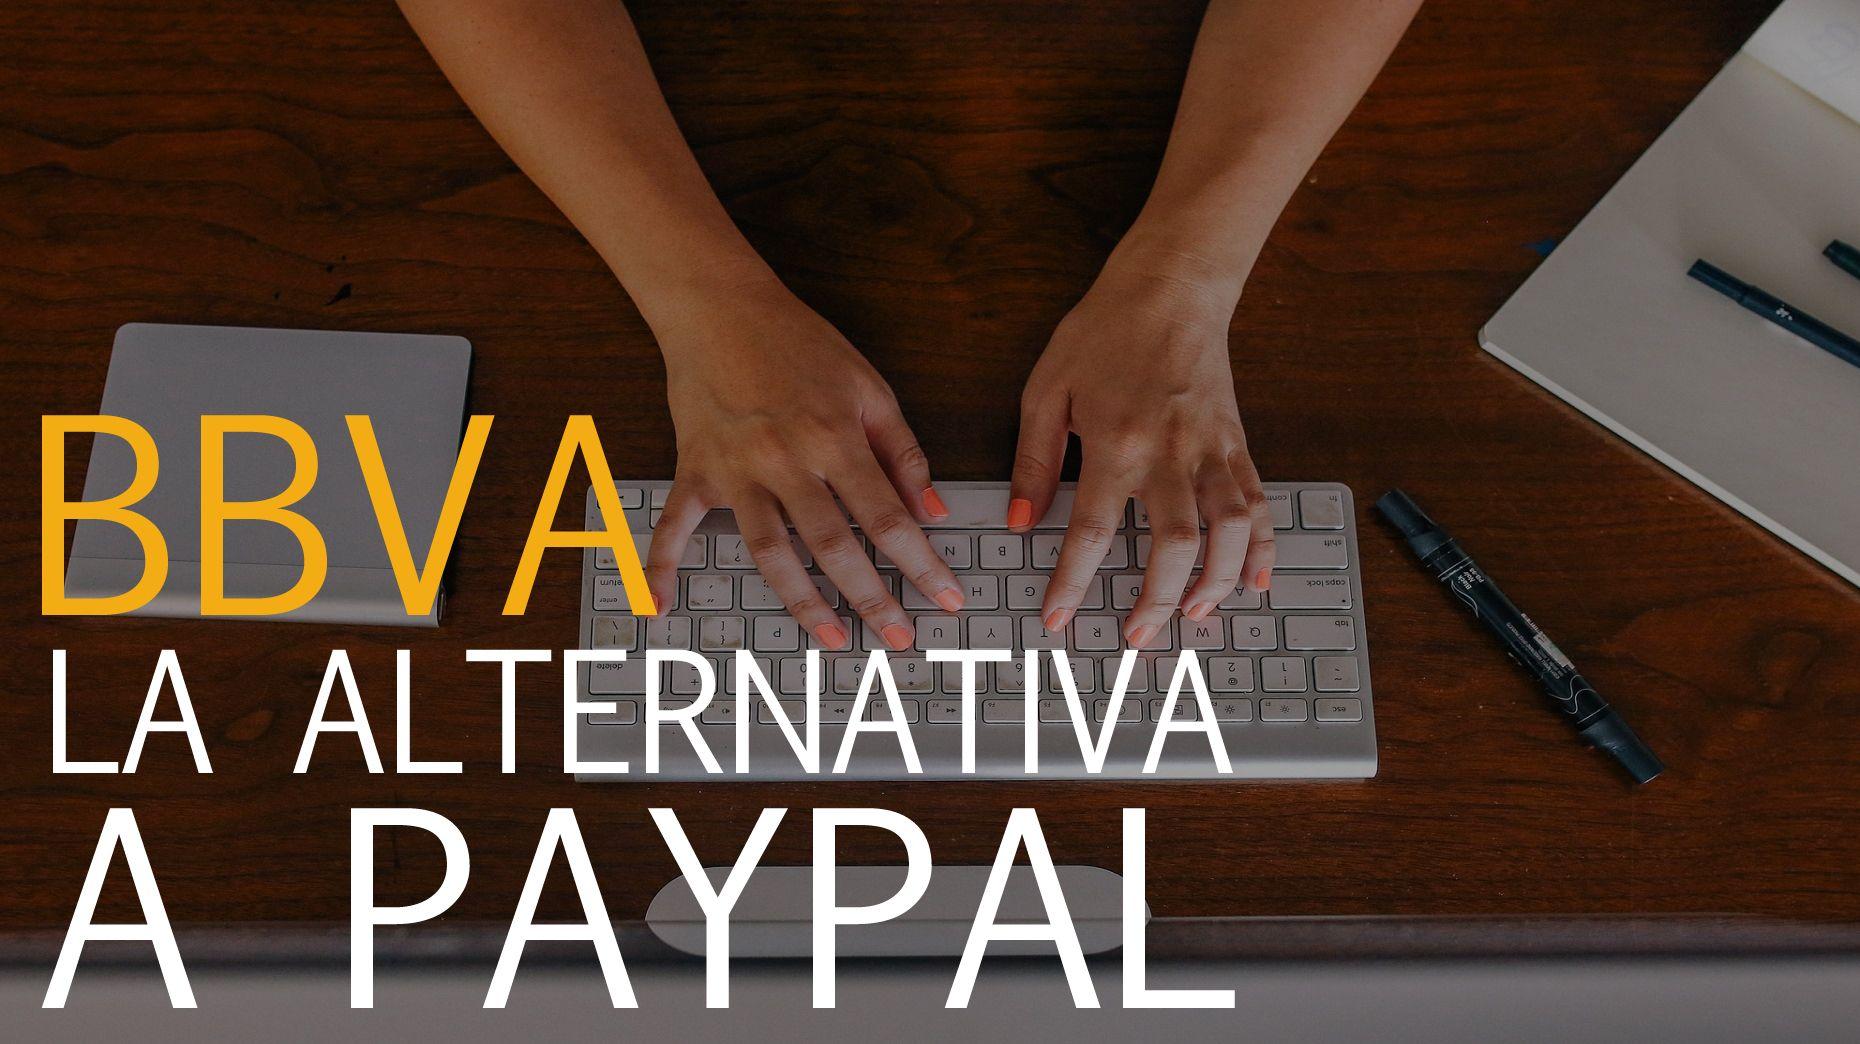 La plataforma de pagos en ecommerce de BBVA